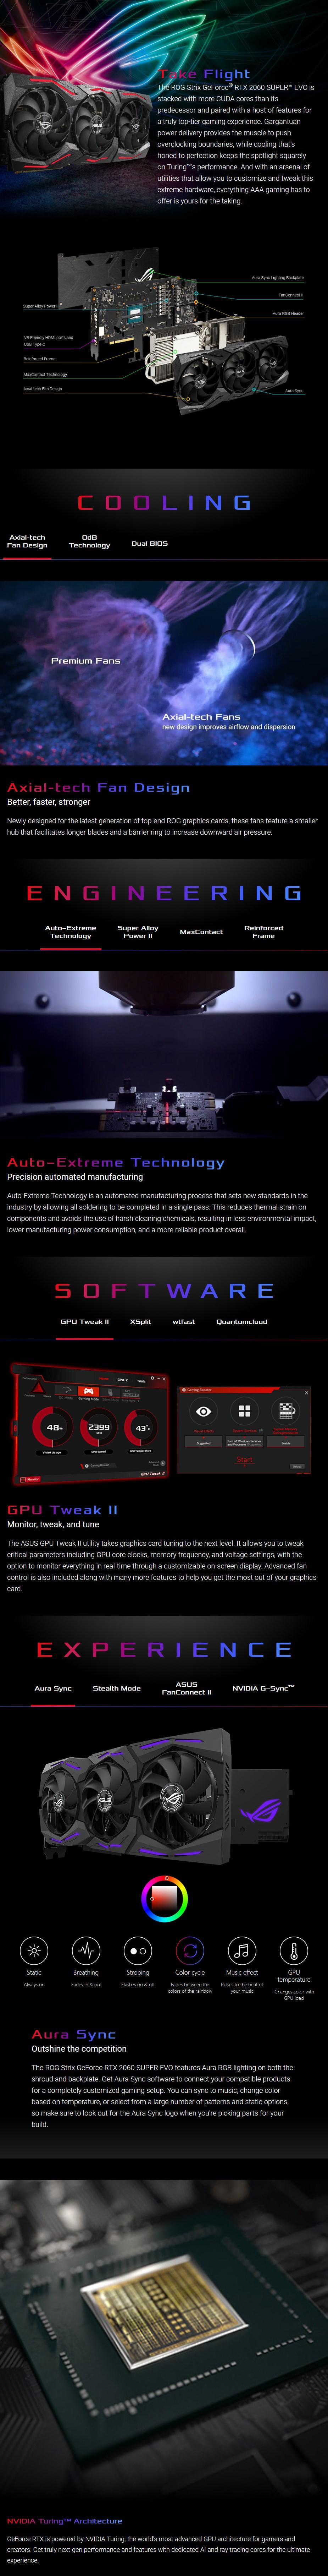 ASUS GeForce RTX 2060 SUPER ROG Strix EVO Gaming Advanced 8GB Video Card - Overview 1